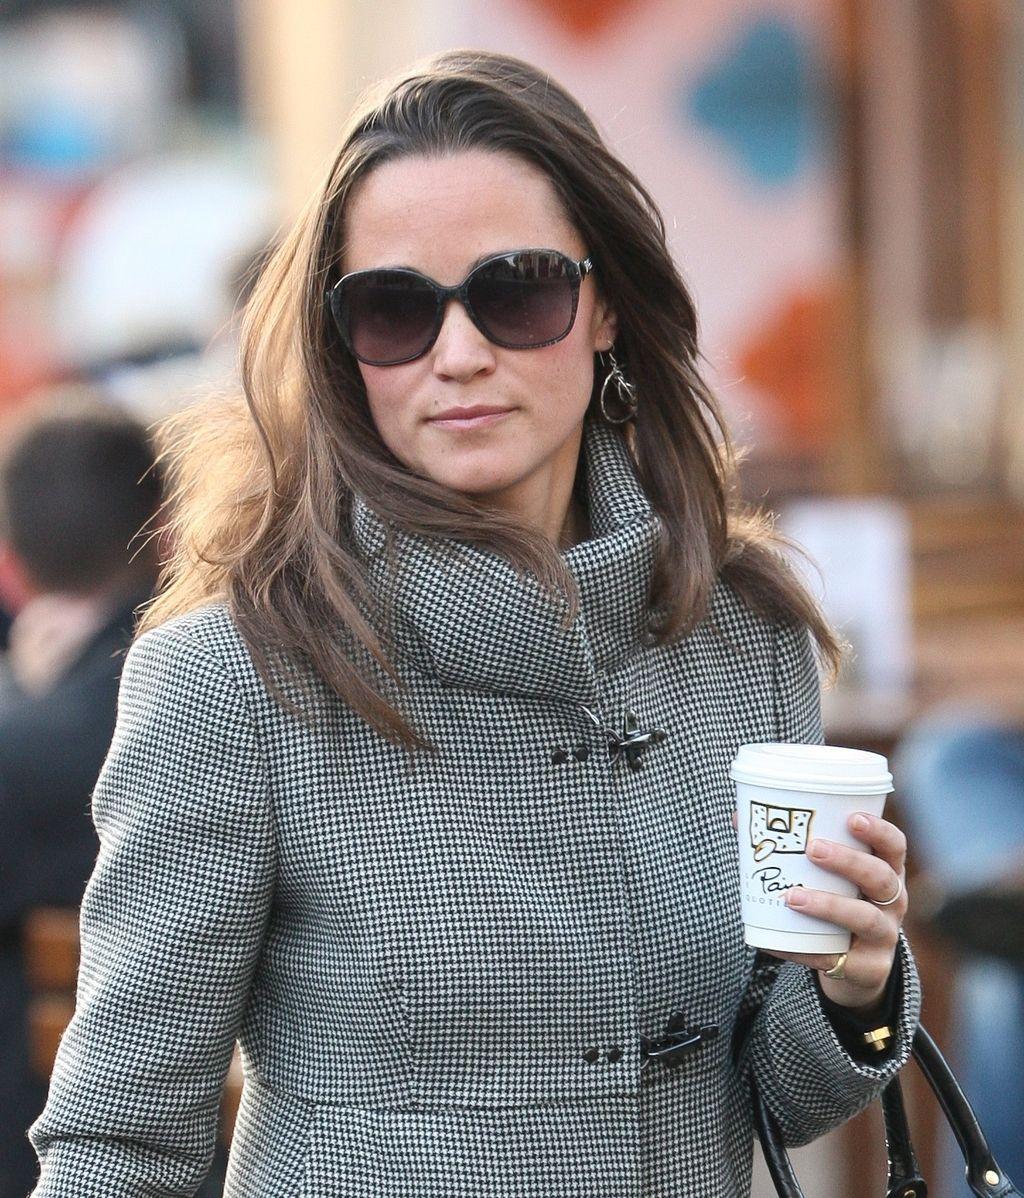 Pippa Middleton ha sido tachada de oportunista